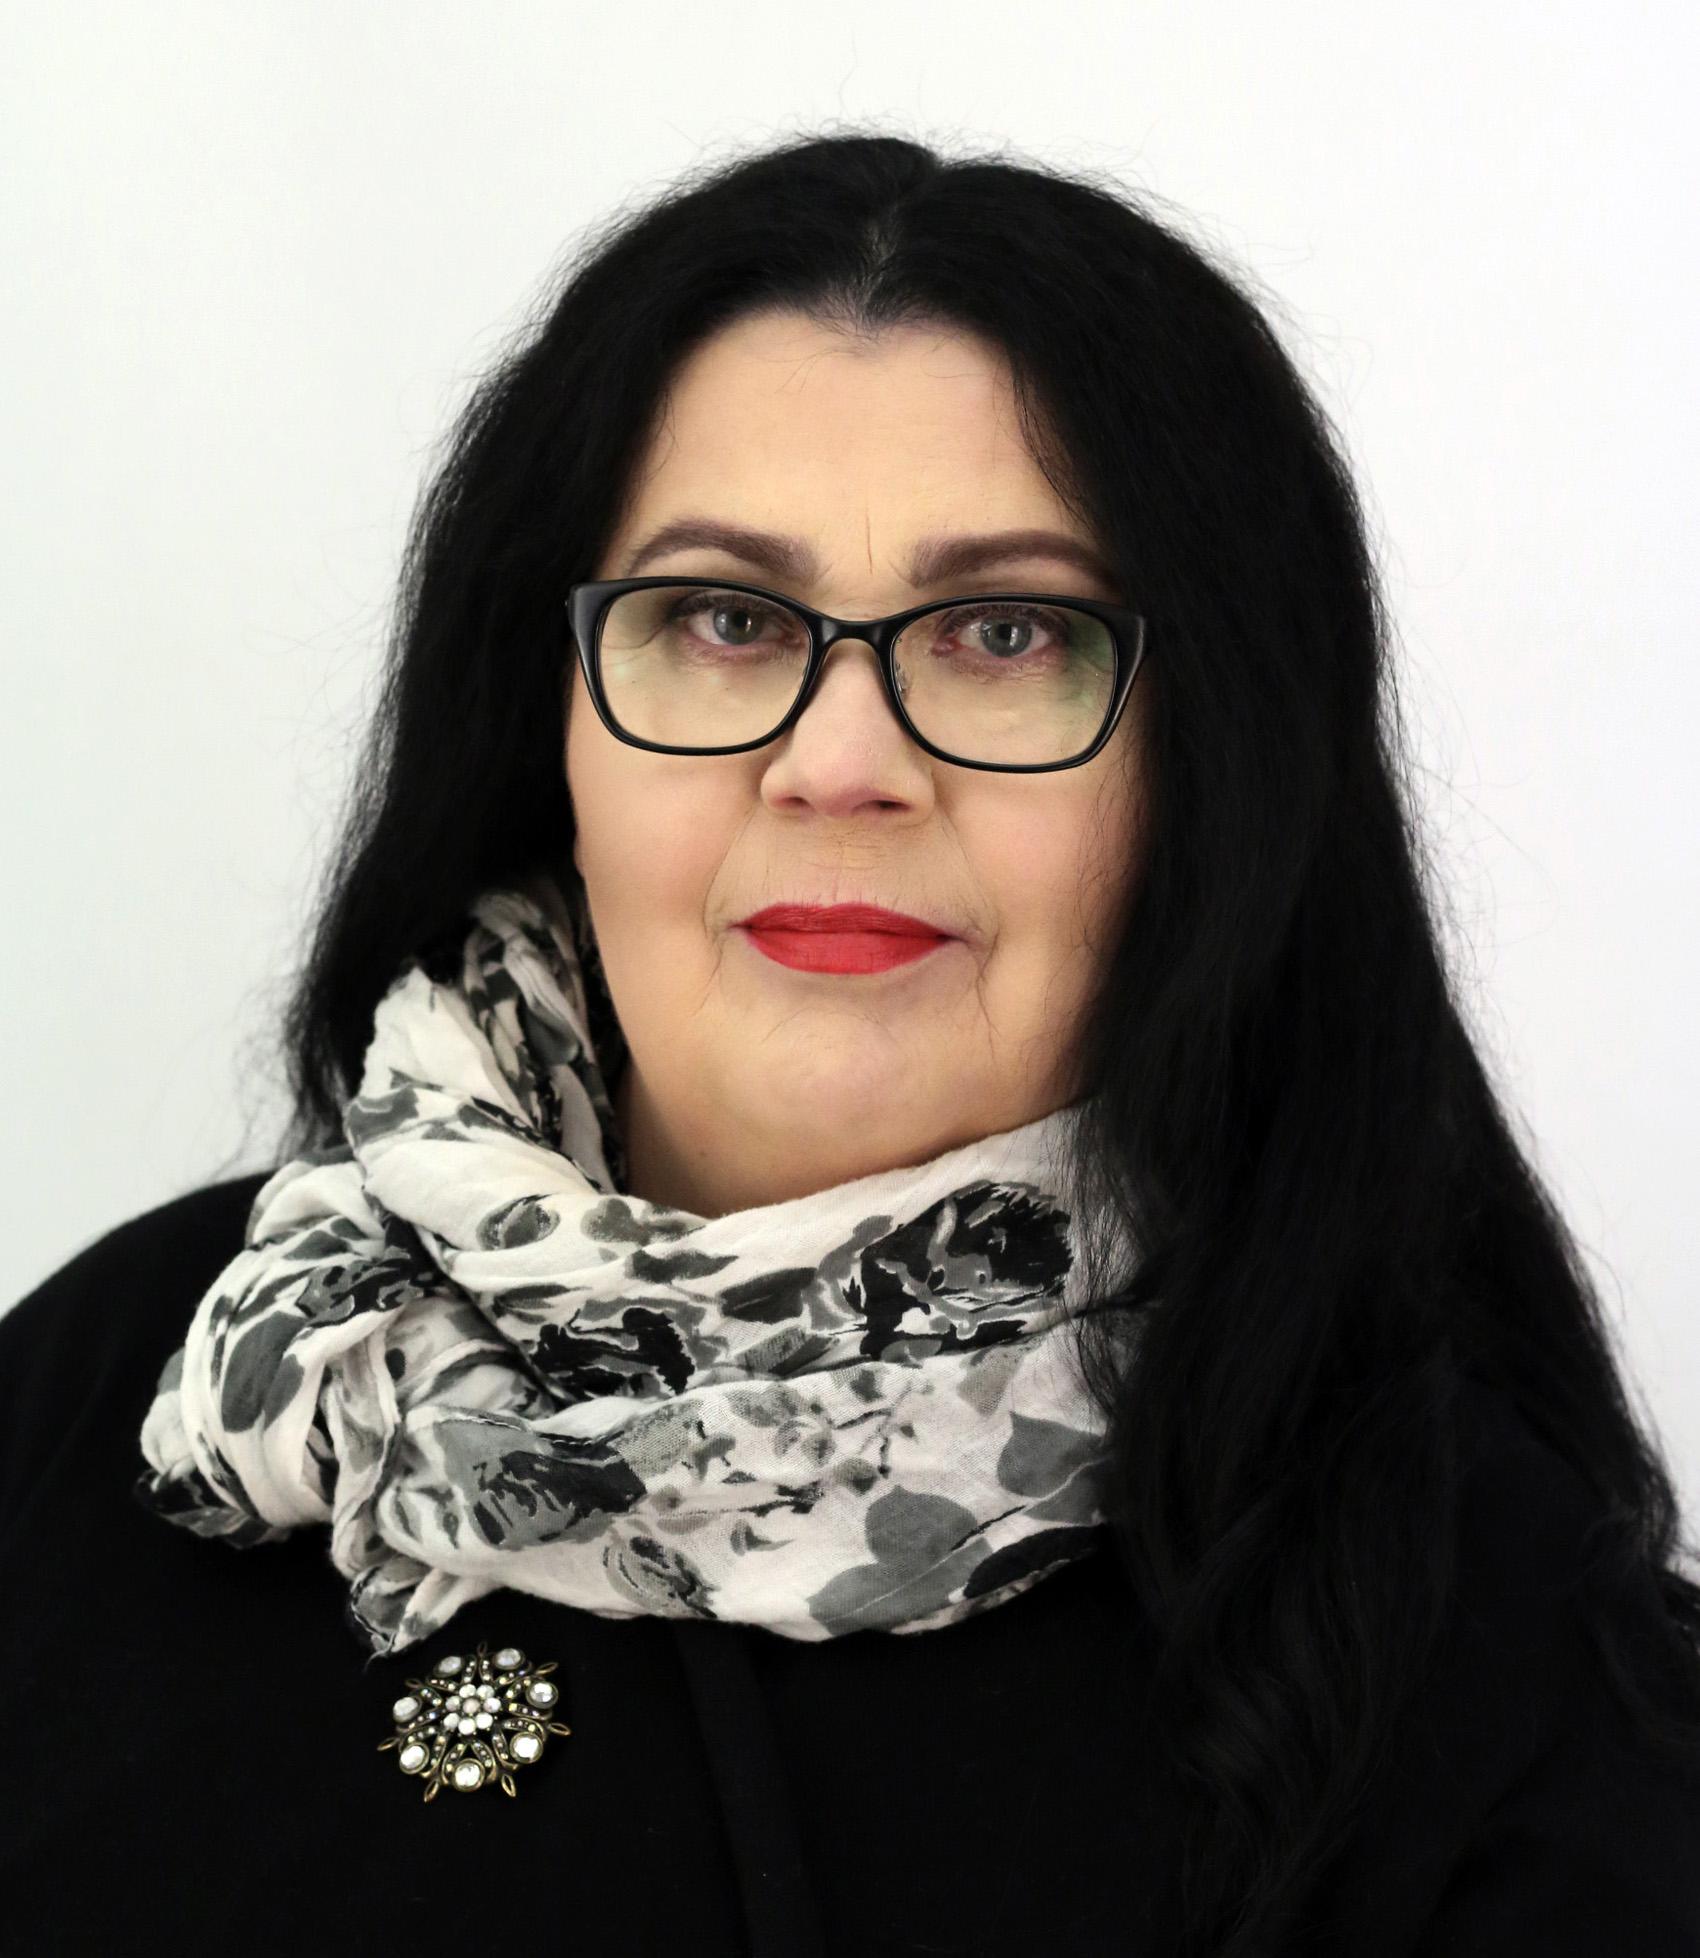 Jaana Nordström